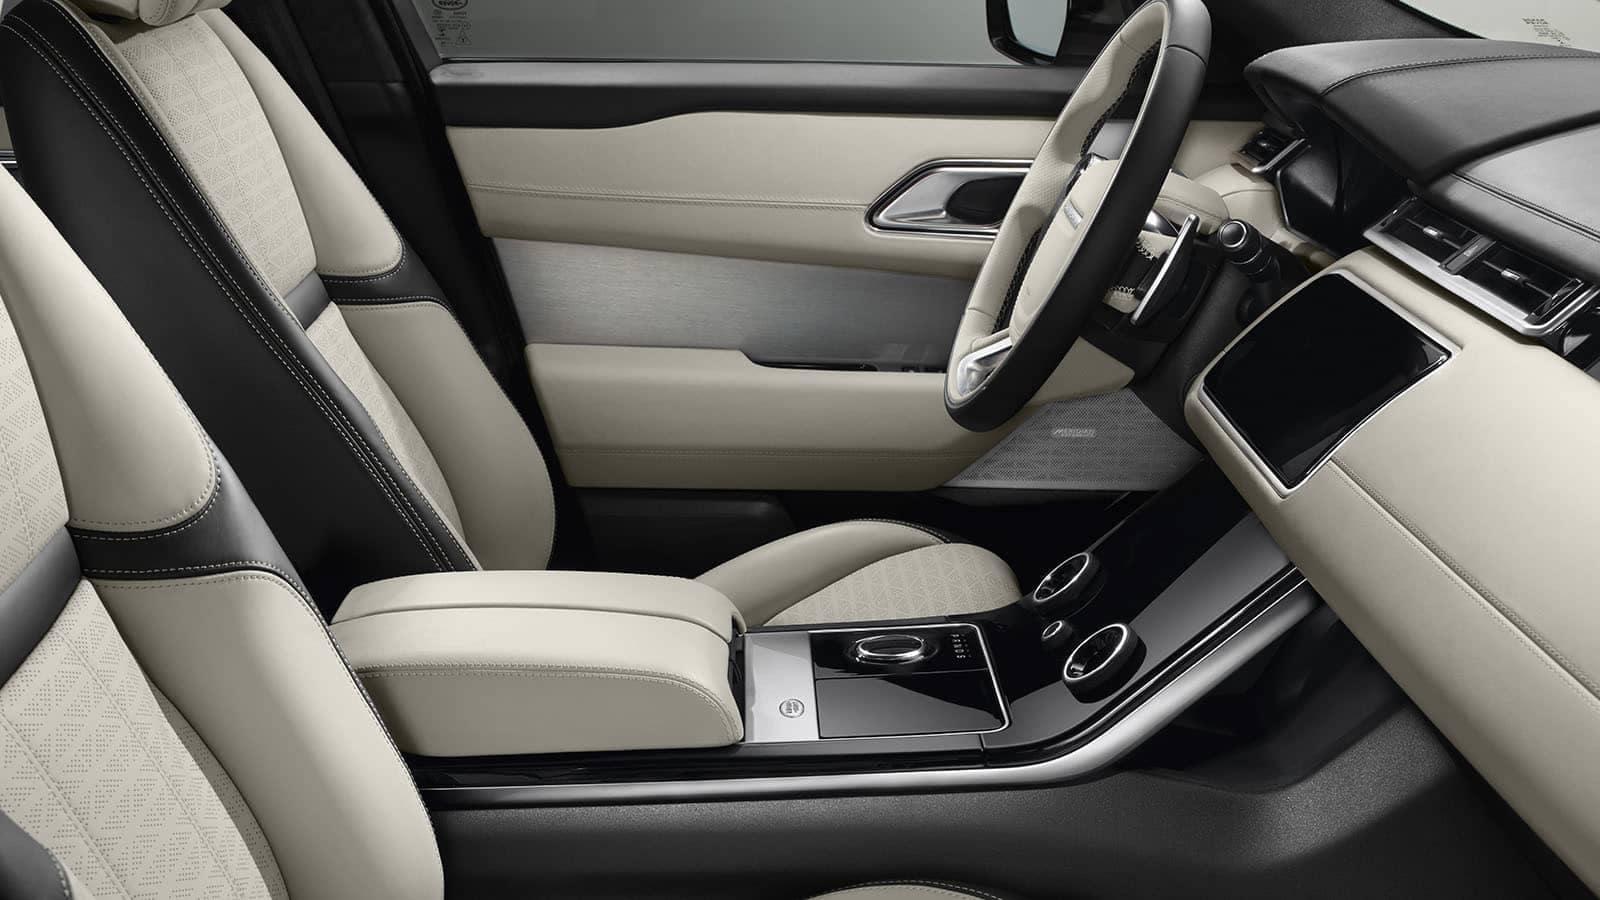 2019 Land Rover Range Rover Velar front seating